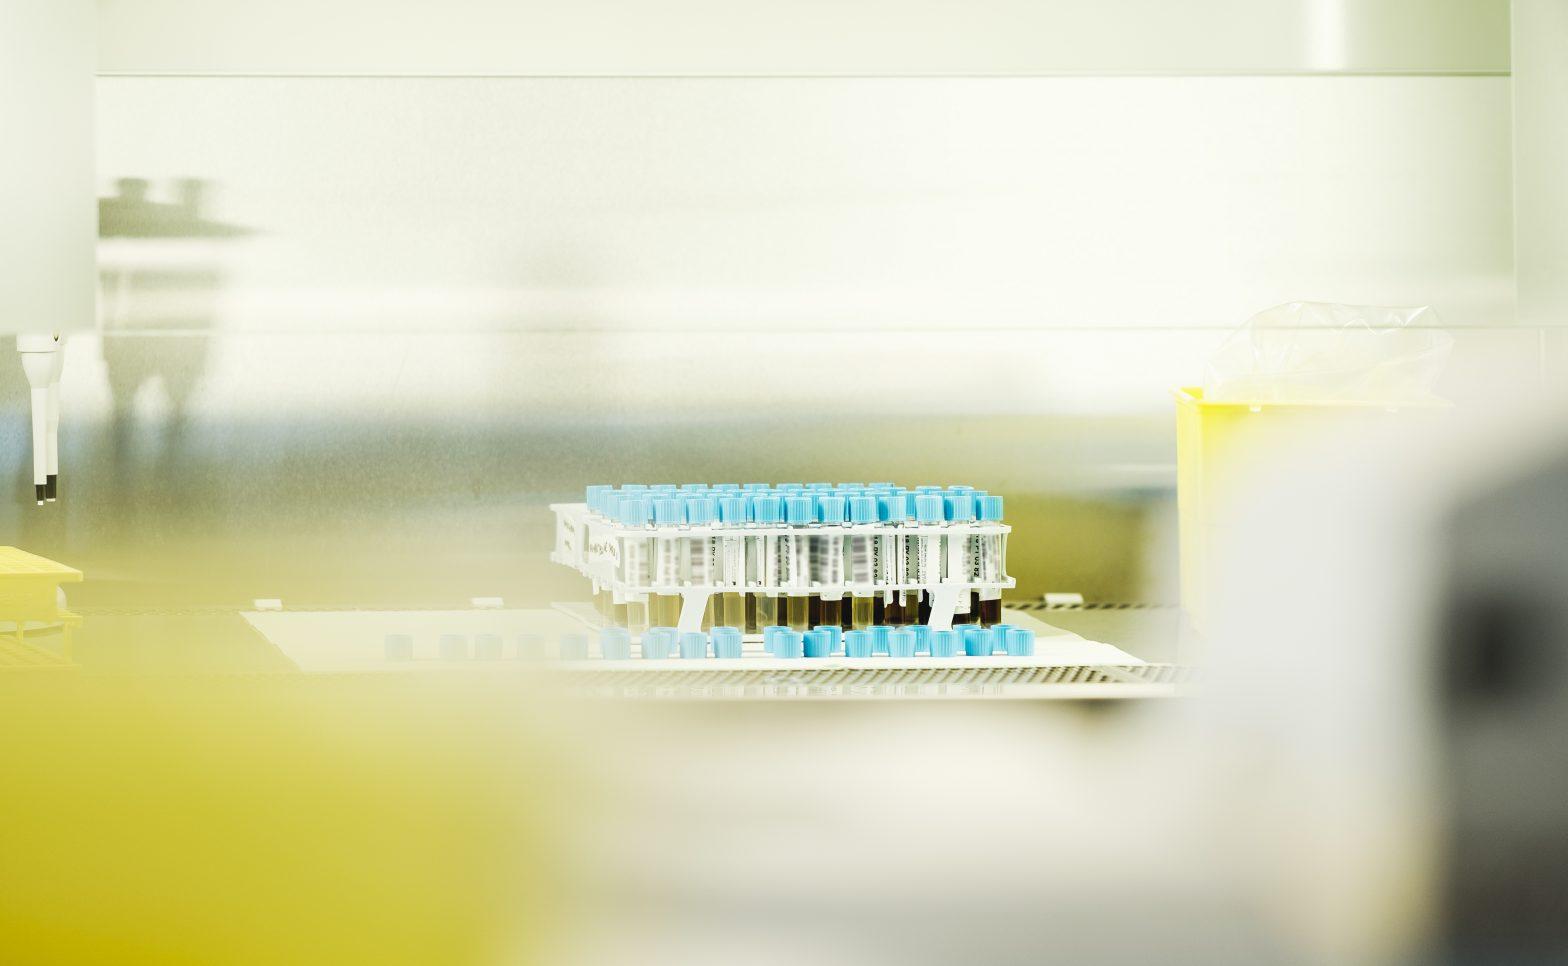 laboratorio lappeenranta